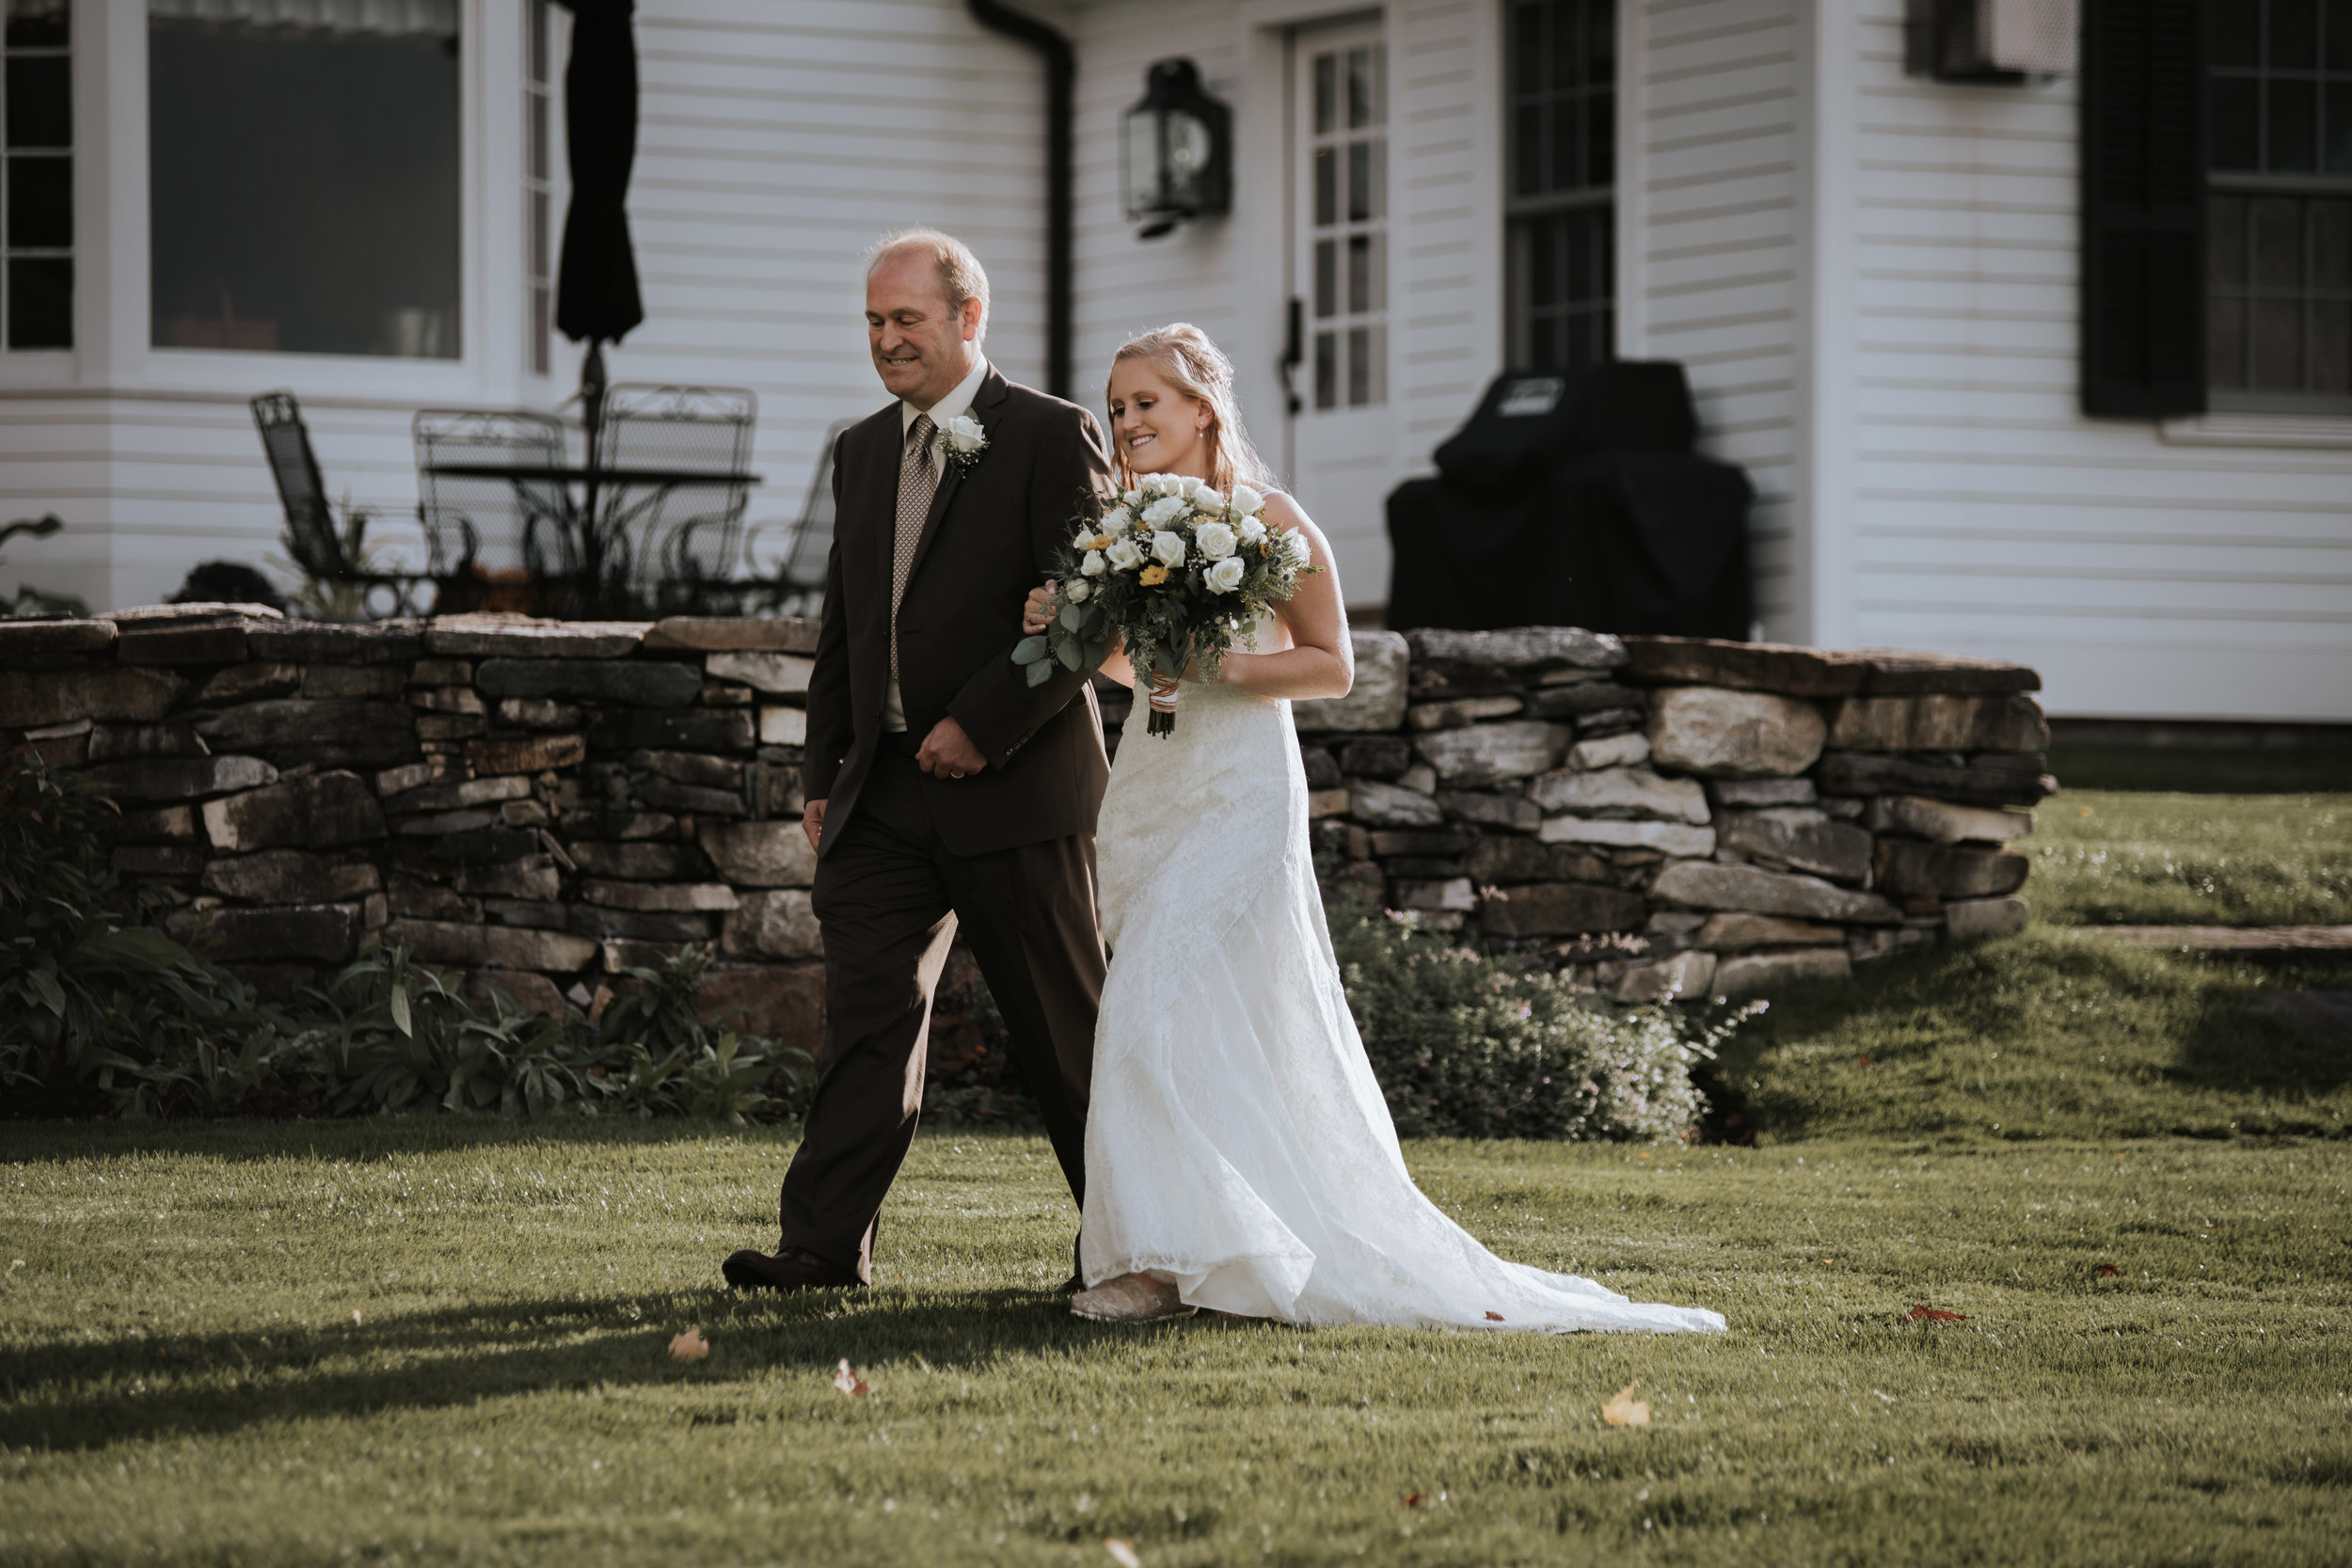 Vermont Wedding | Lorianna Weathers Photography-0483.jpg